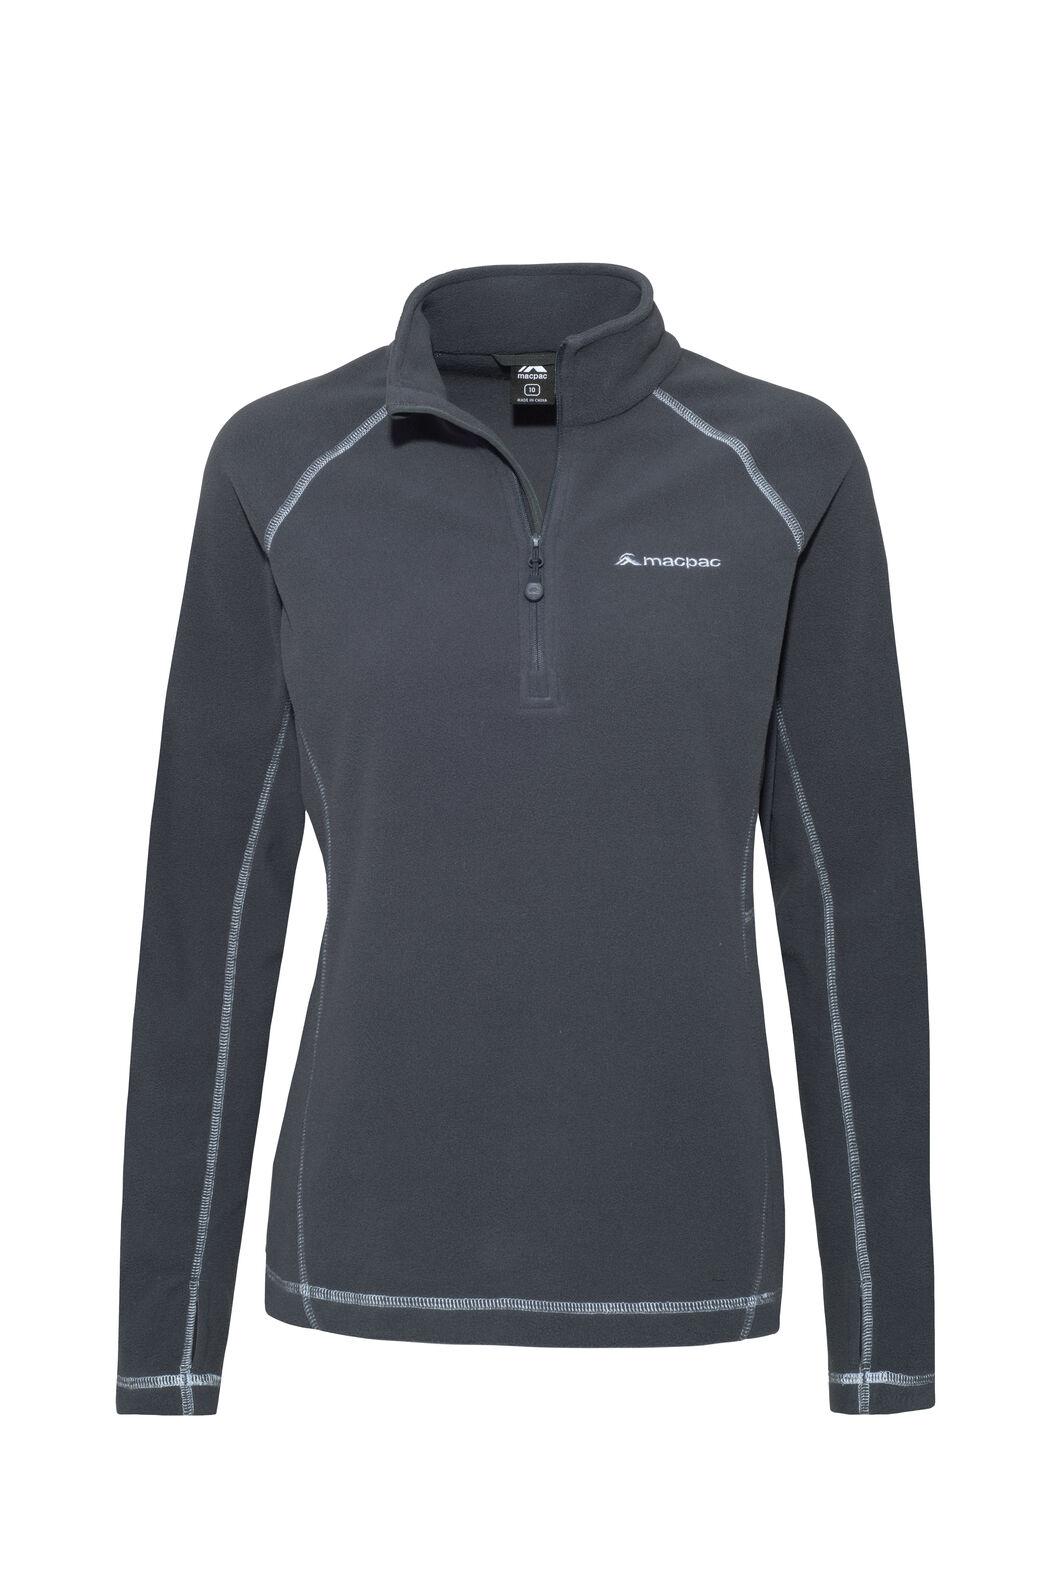 Macpac Tui Polartec® Micro Fleece® Pullover — Women's, India Ink, hi-res